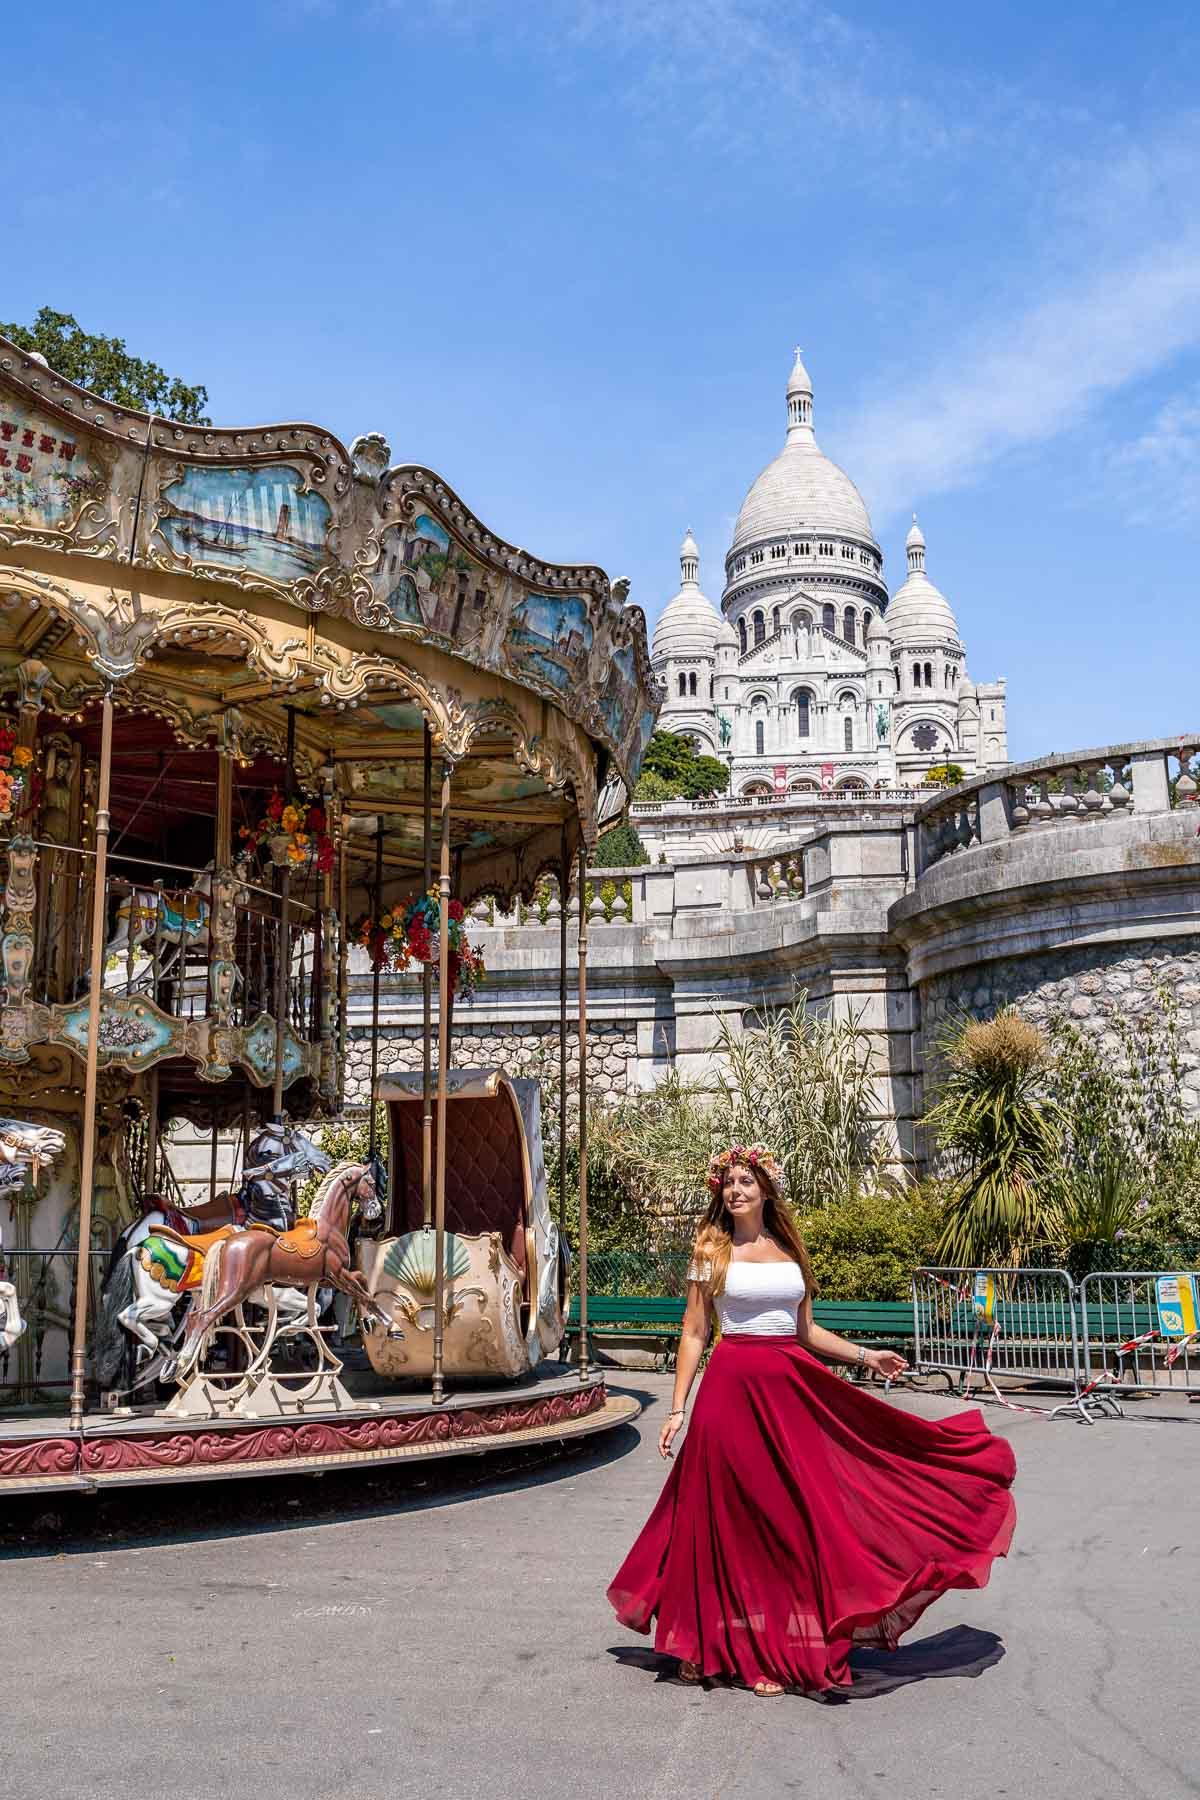 Girl in a red skirt twirling in front of Carrousel de Saint-Pierre in Montmartre, Paris